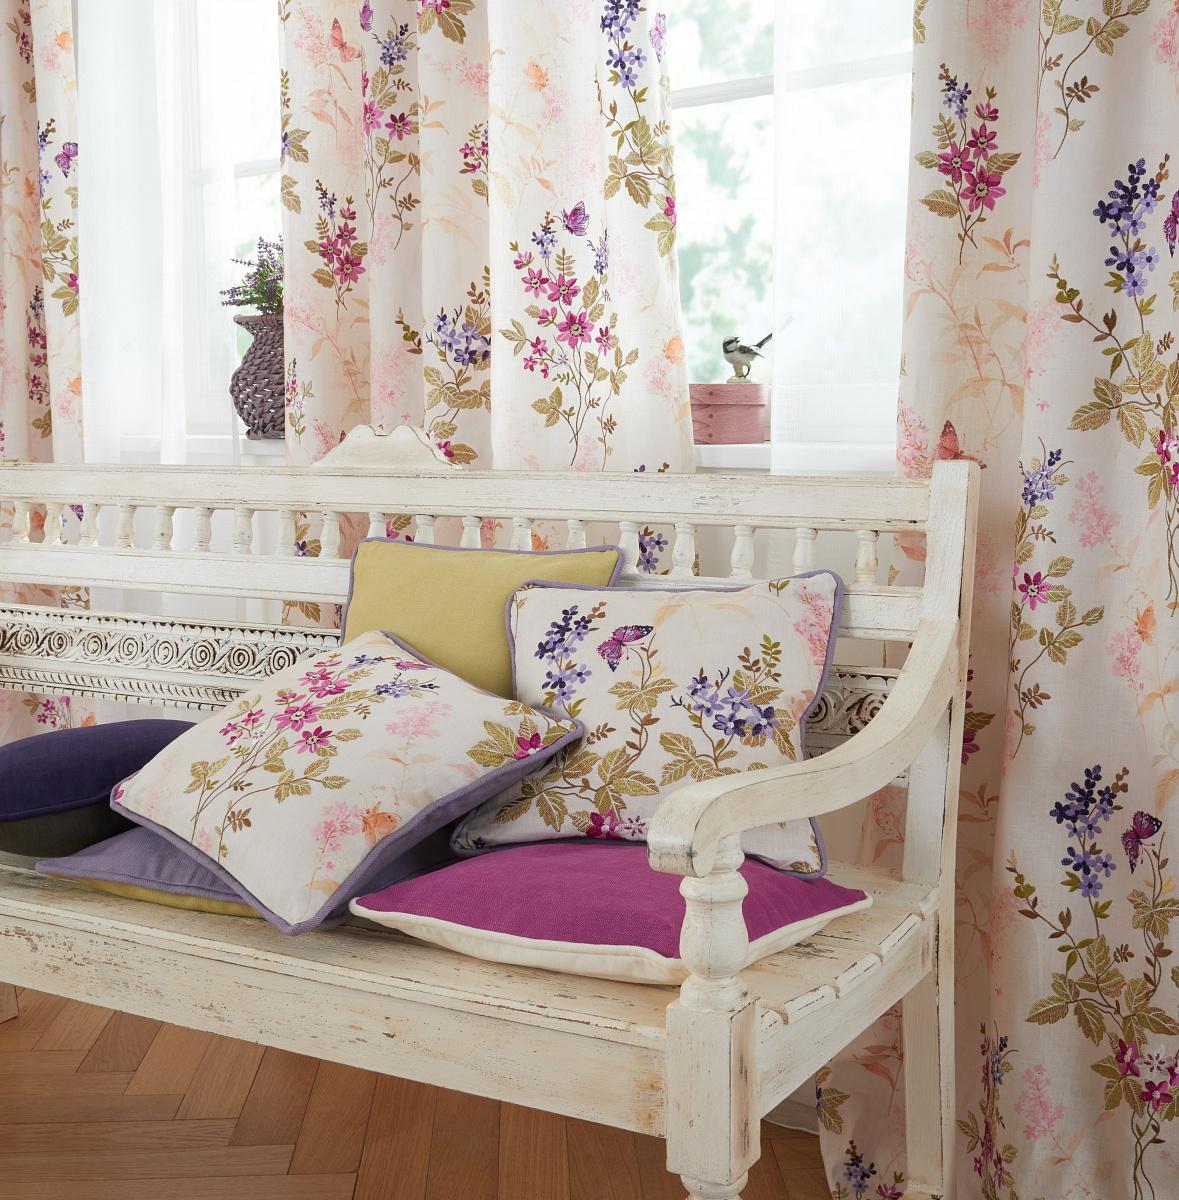 saum viebahn modern 2016 mantis cz. Black Bedroom Furniture Sets. Home Design Ideas